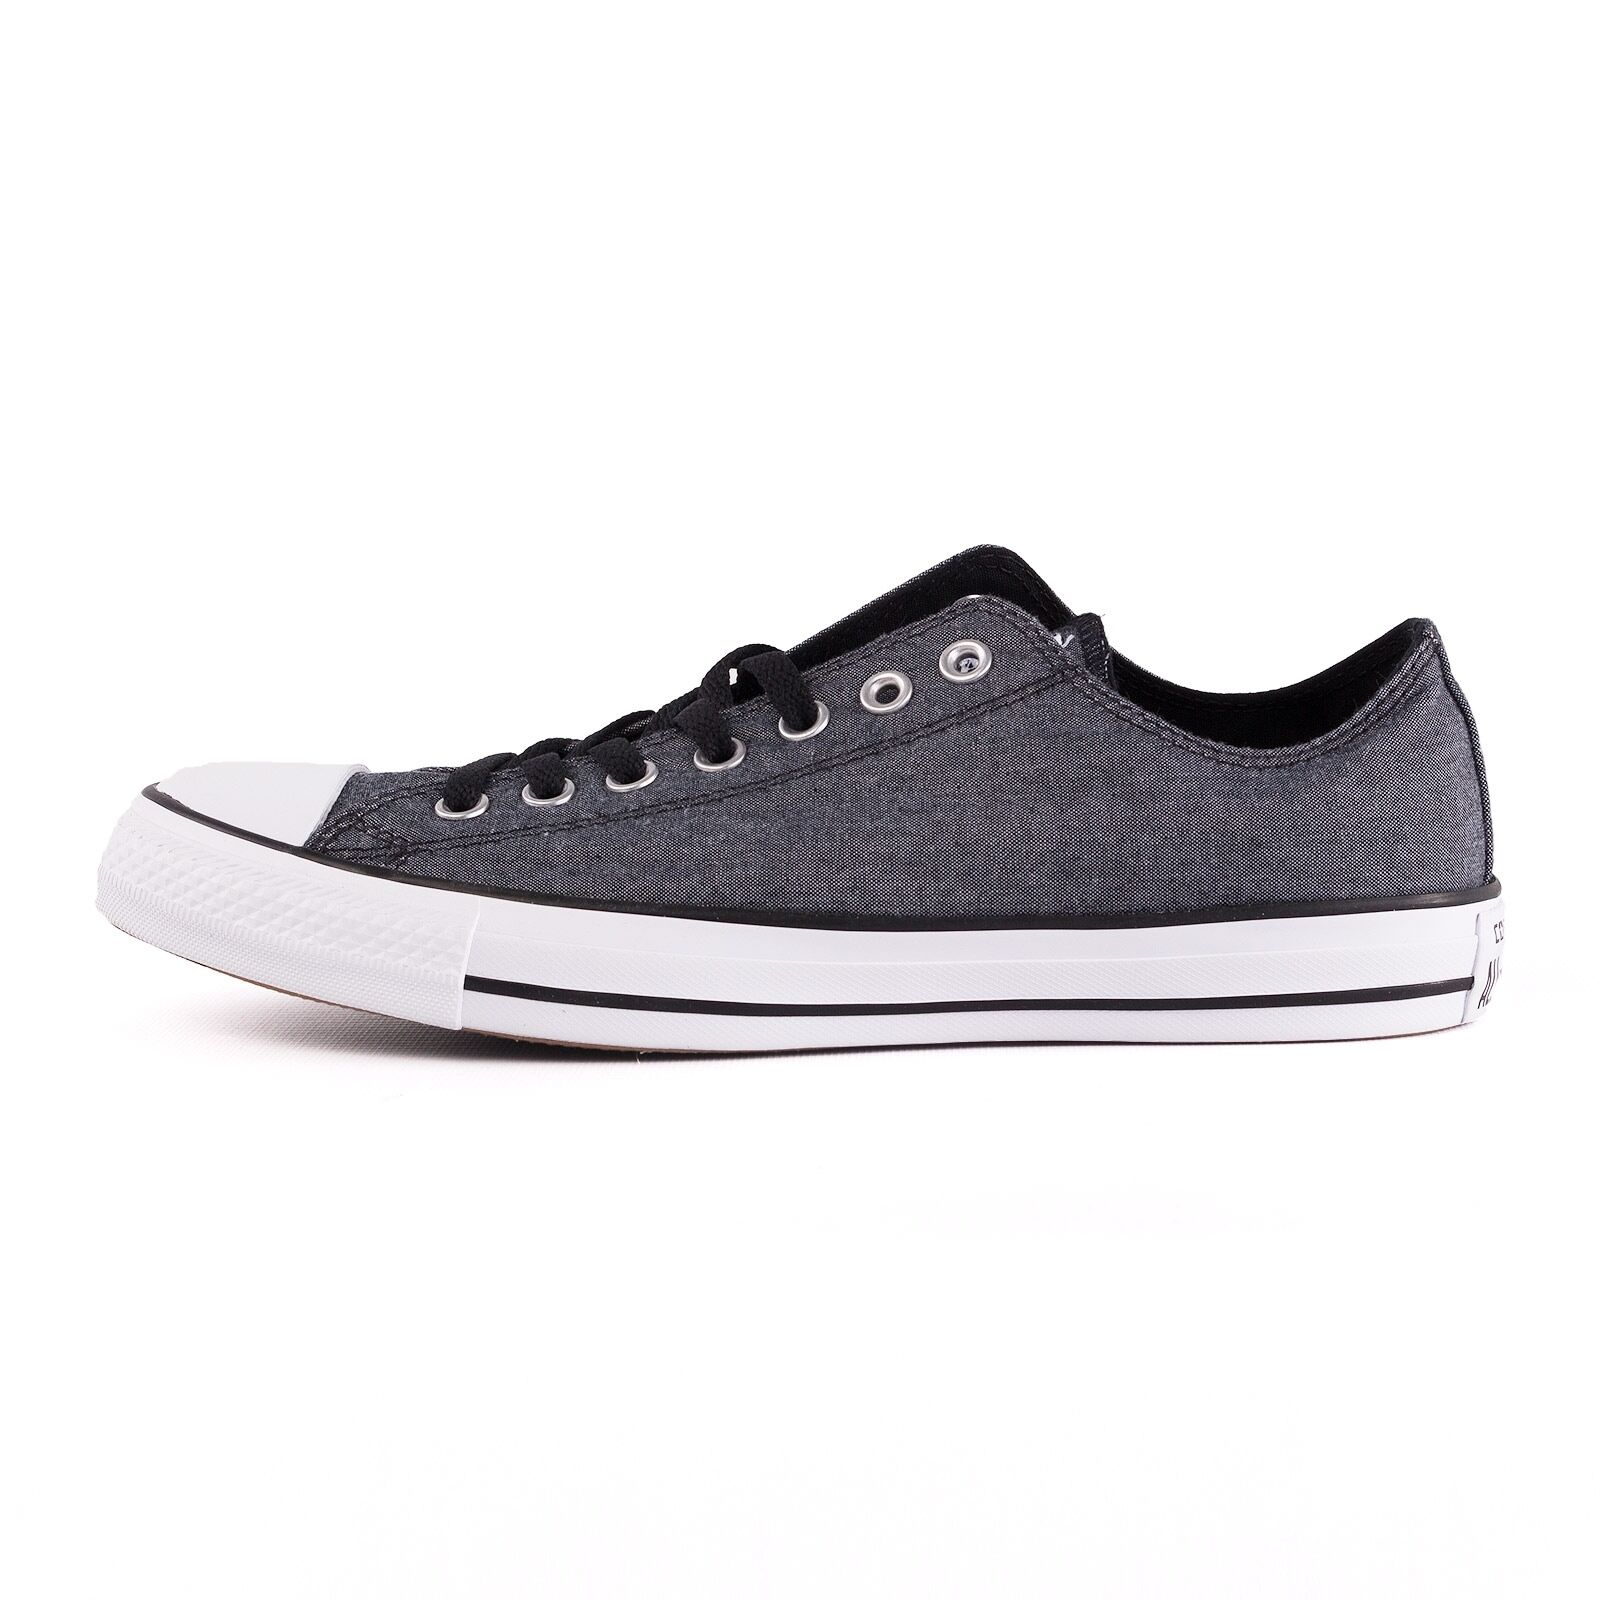 Converse ctas zapatillas Ox caballero zapatillas ctas zapato, Negro/Blanco, 51230 451bf7